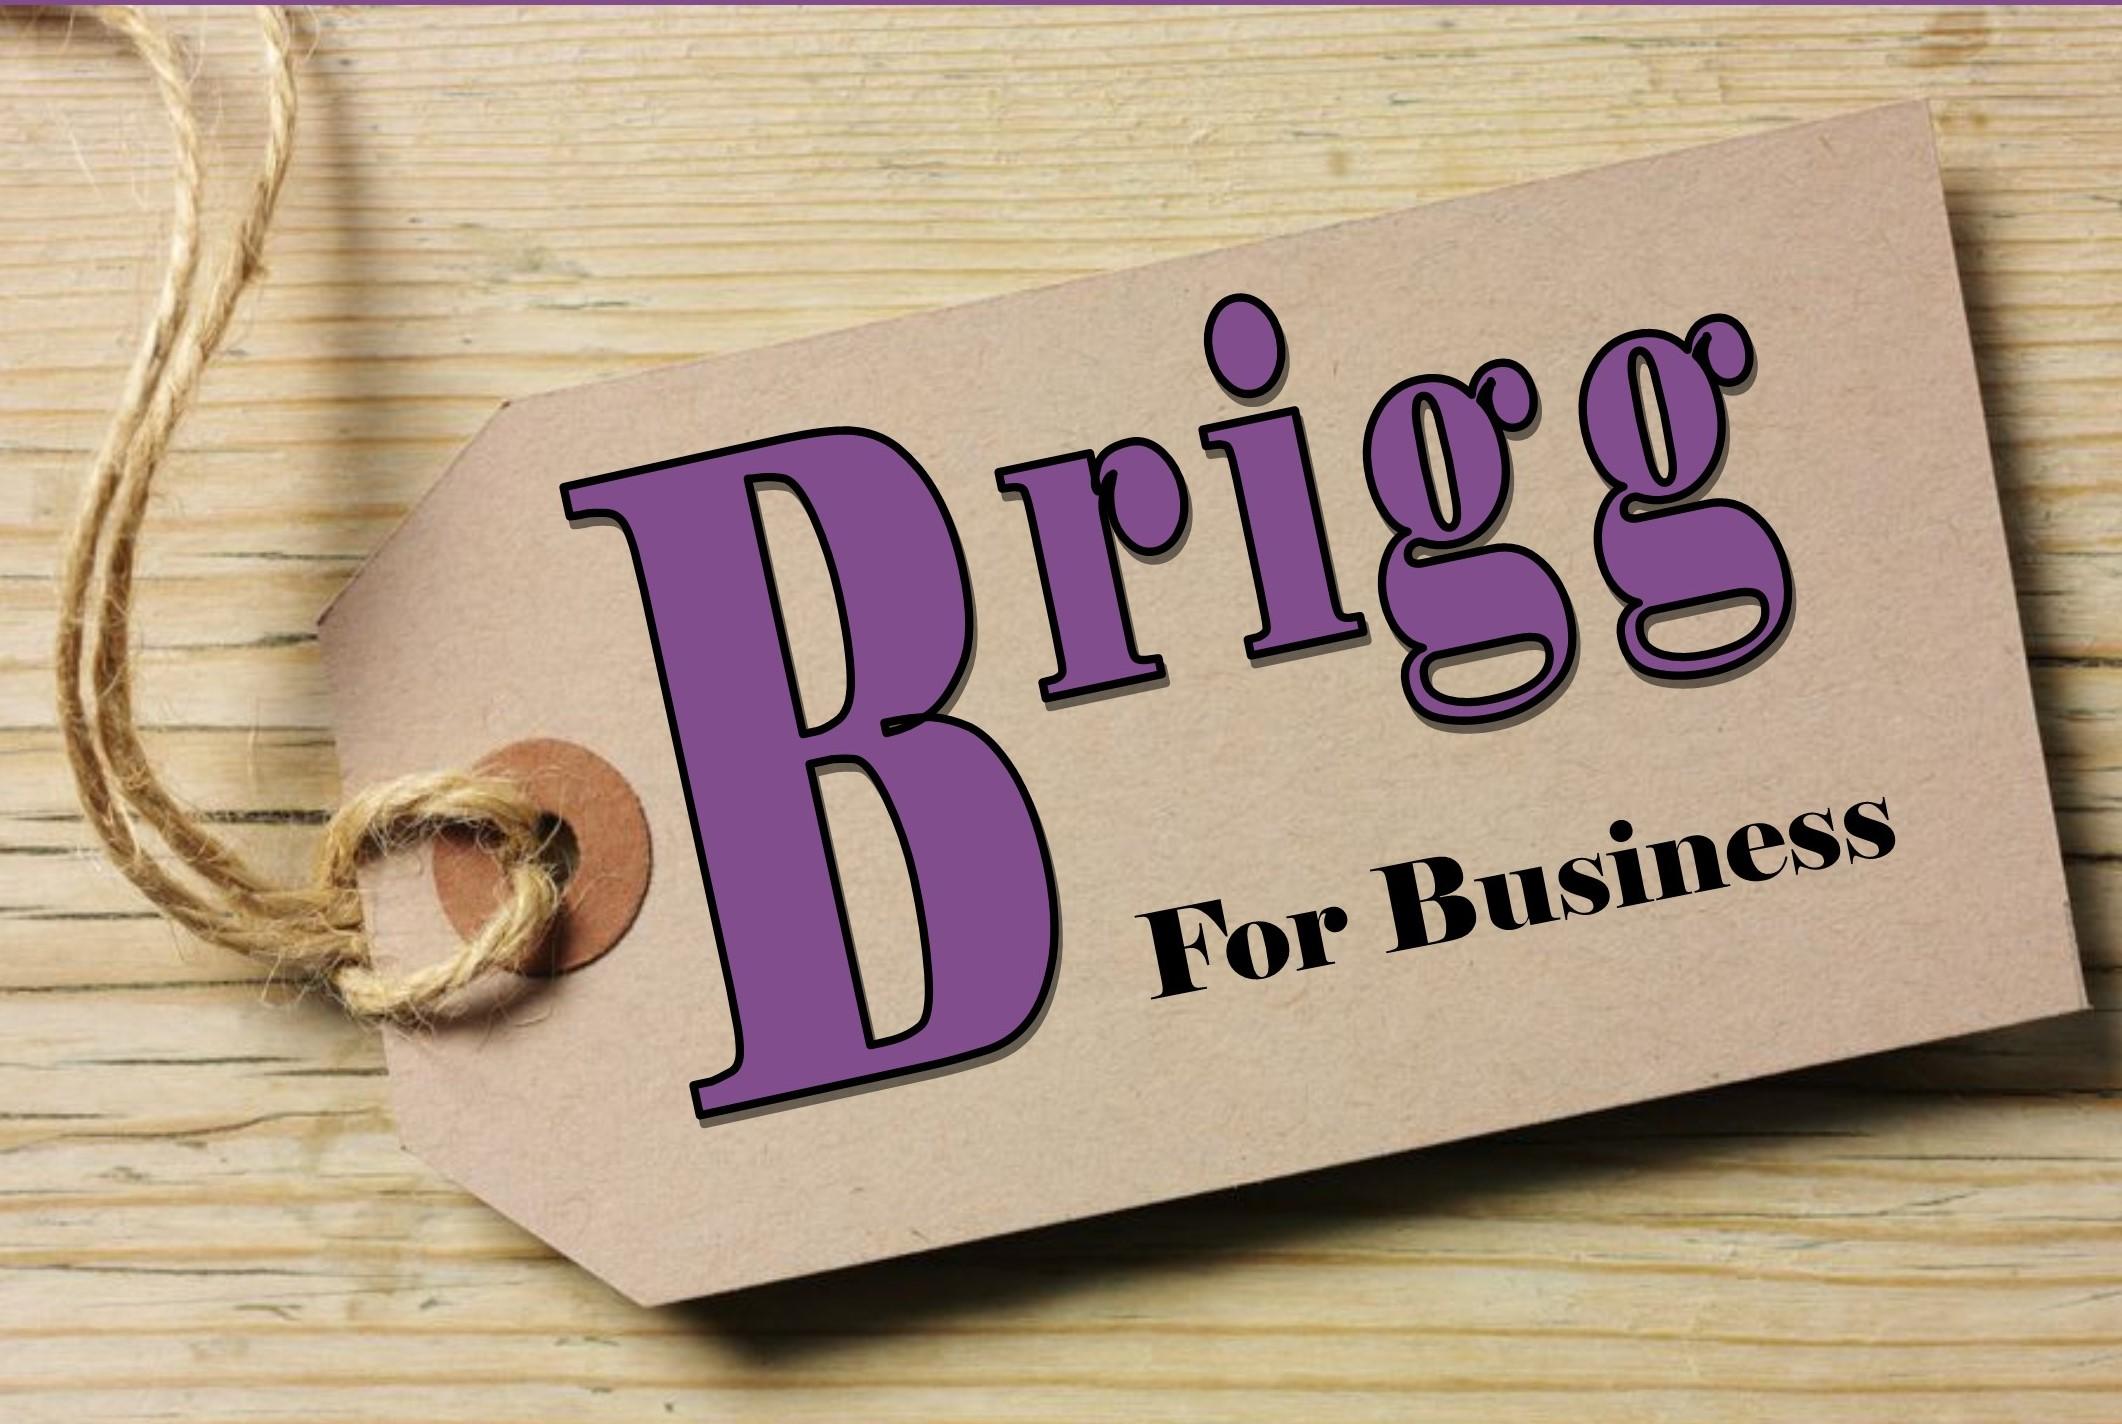 Visit Brigg